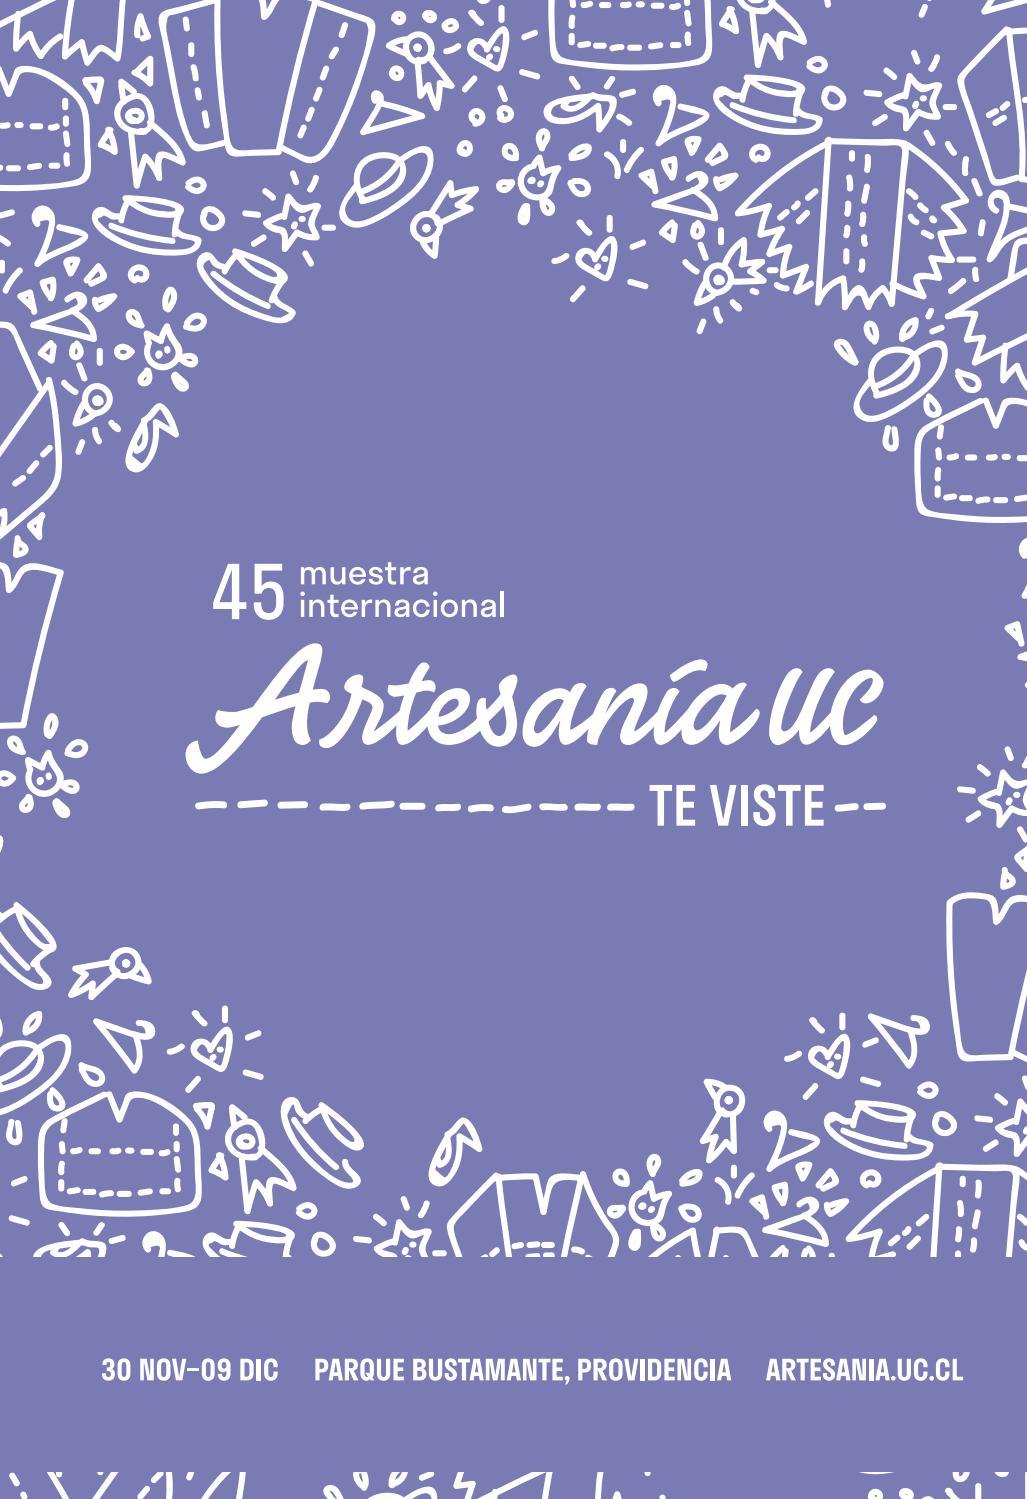 05dfba2581e7 Catálogo 45 Muestra de Artesanía UC by Artesanía UC - issuu